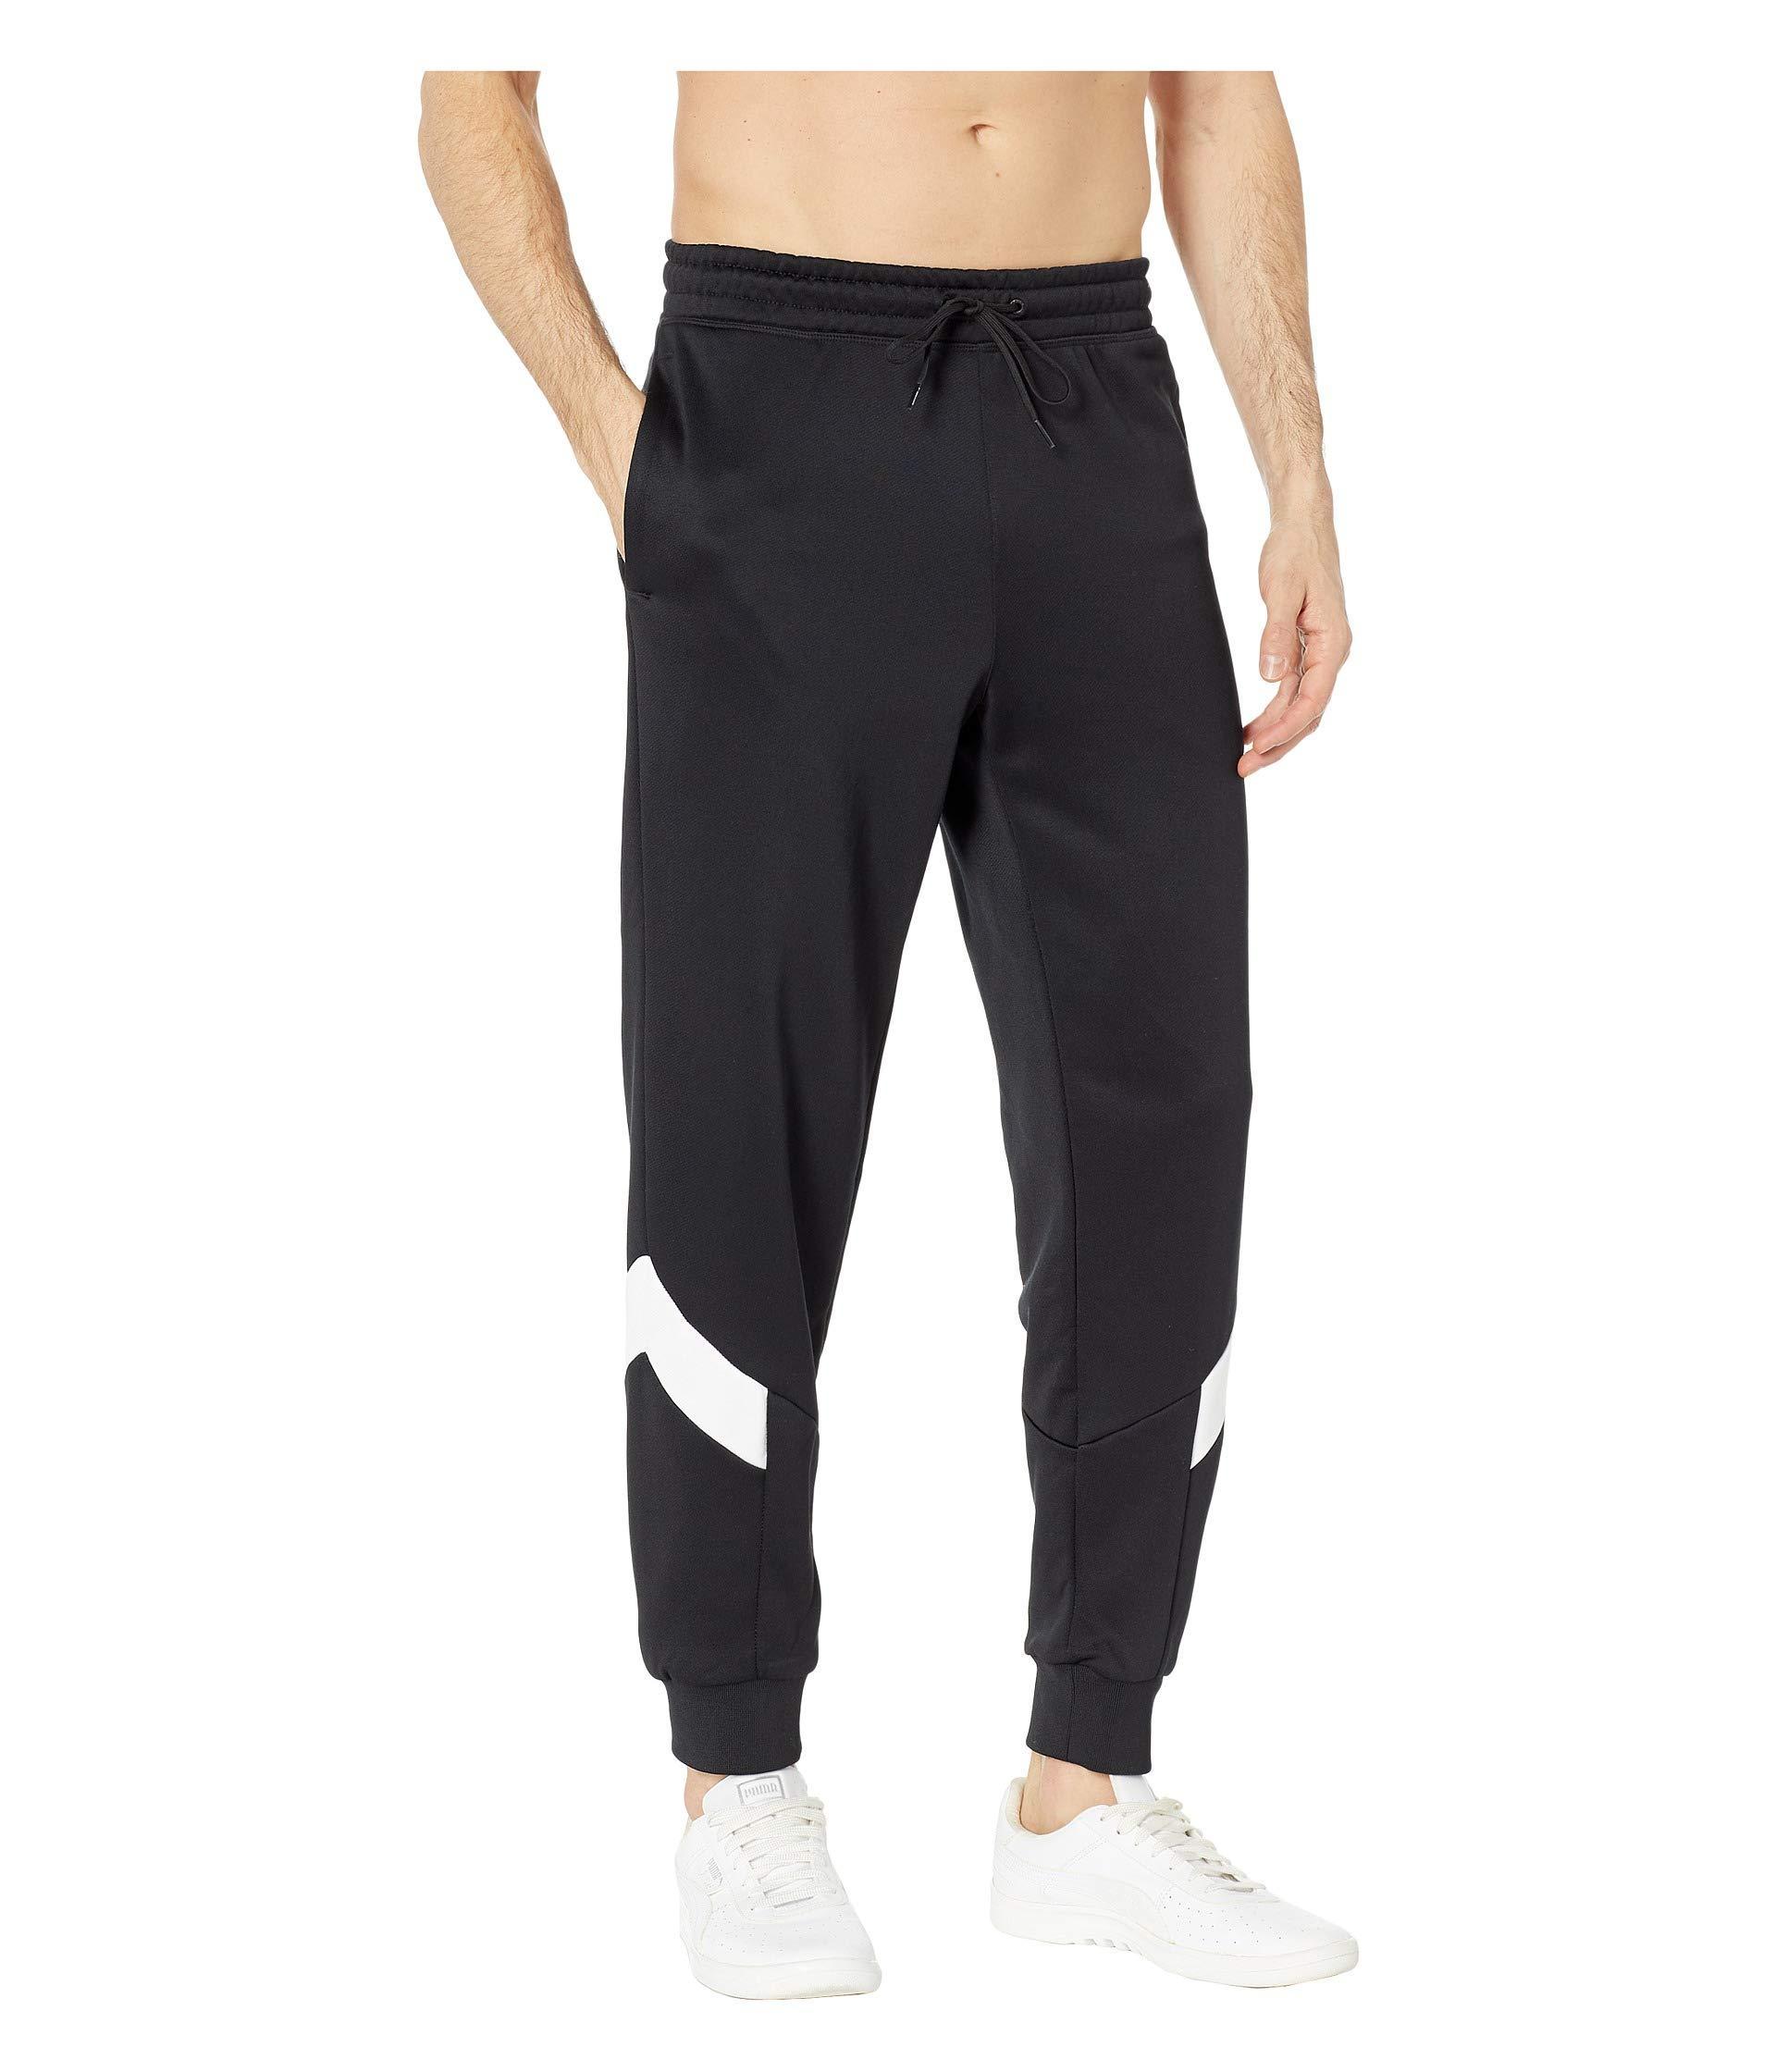 0ade1ee5cc PUMA Iconic Mcs Track Pants ( Black 2) Men's Casual Pants in Black ...